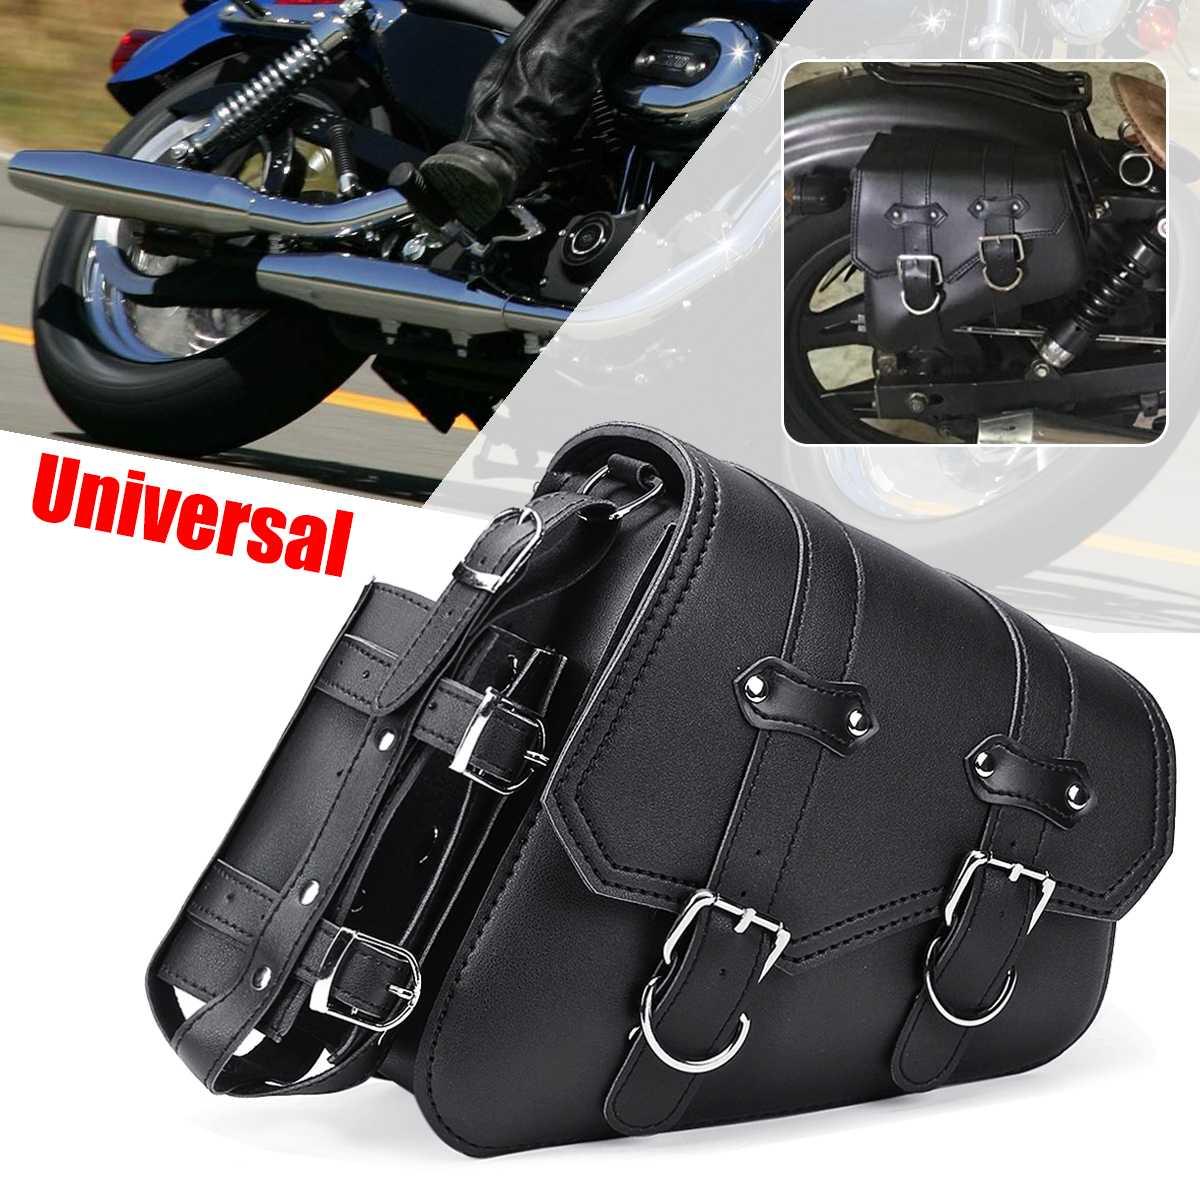 Sillín de motocicleta de cuero PU Universal izquierda derecha para Harley Sportster para Honda Suzuki Kawasaki Yamaha